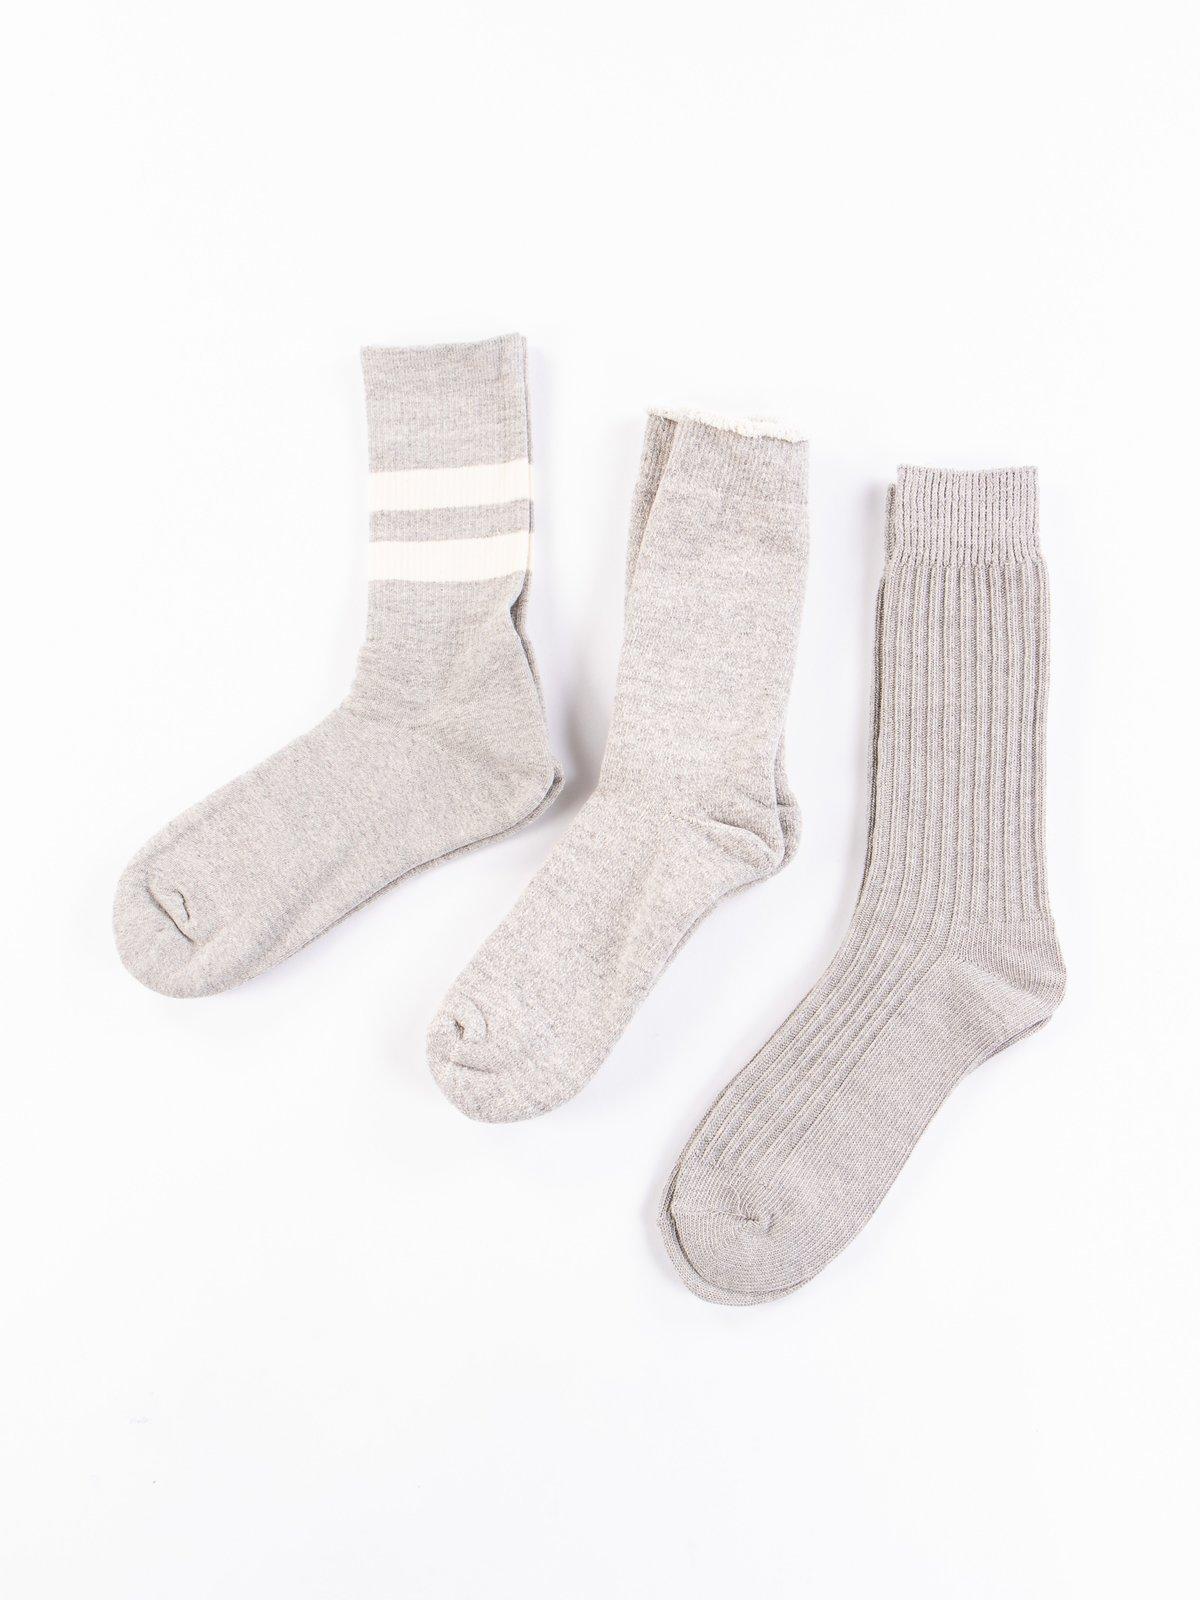 Mix Grey Organic Cotton Special Trio Socks - Image 1